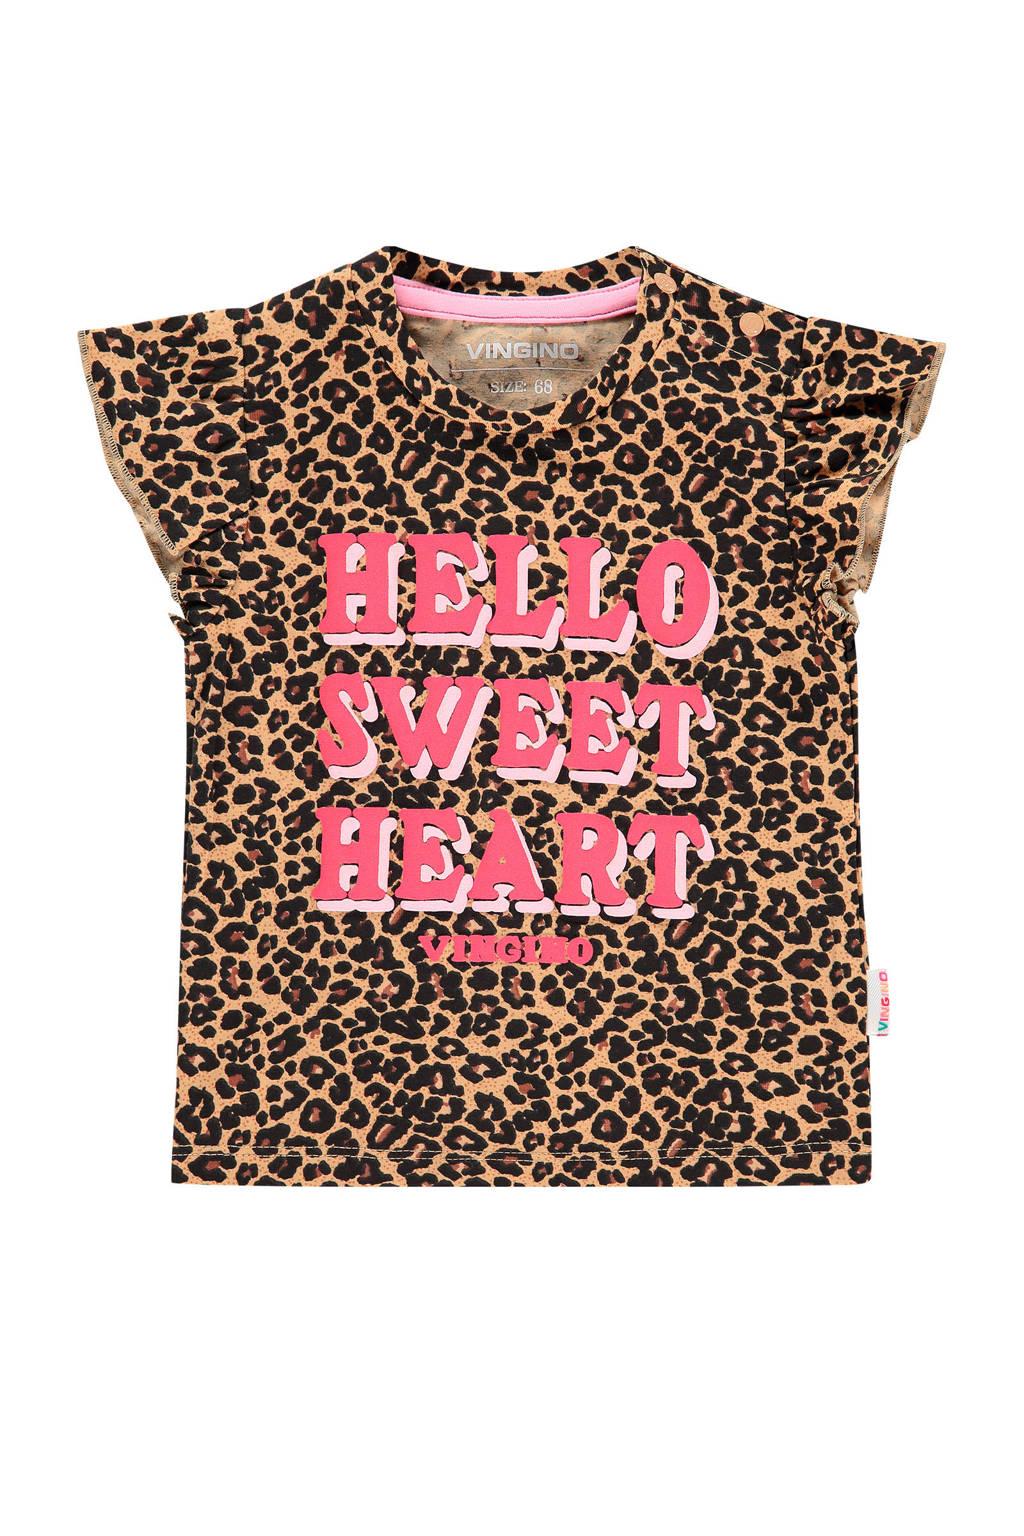 Vingino T-shirt Heidi mini met panterprint bruin/roze, Bruin/roze